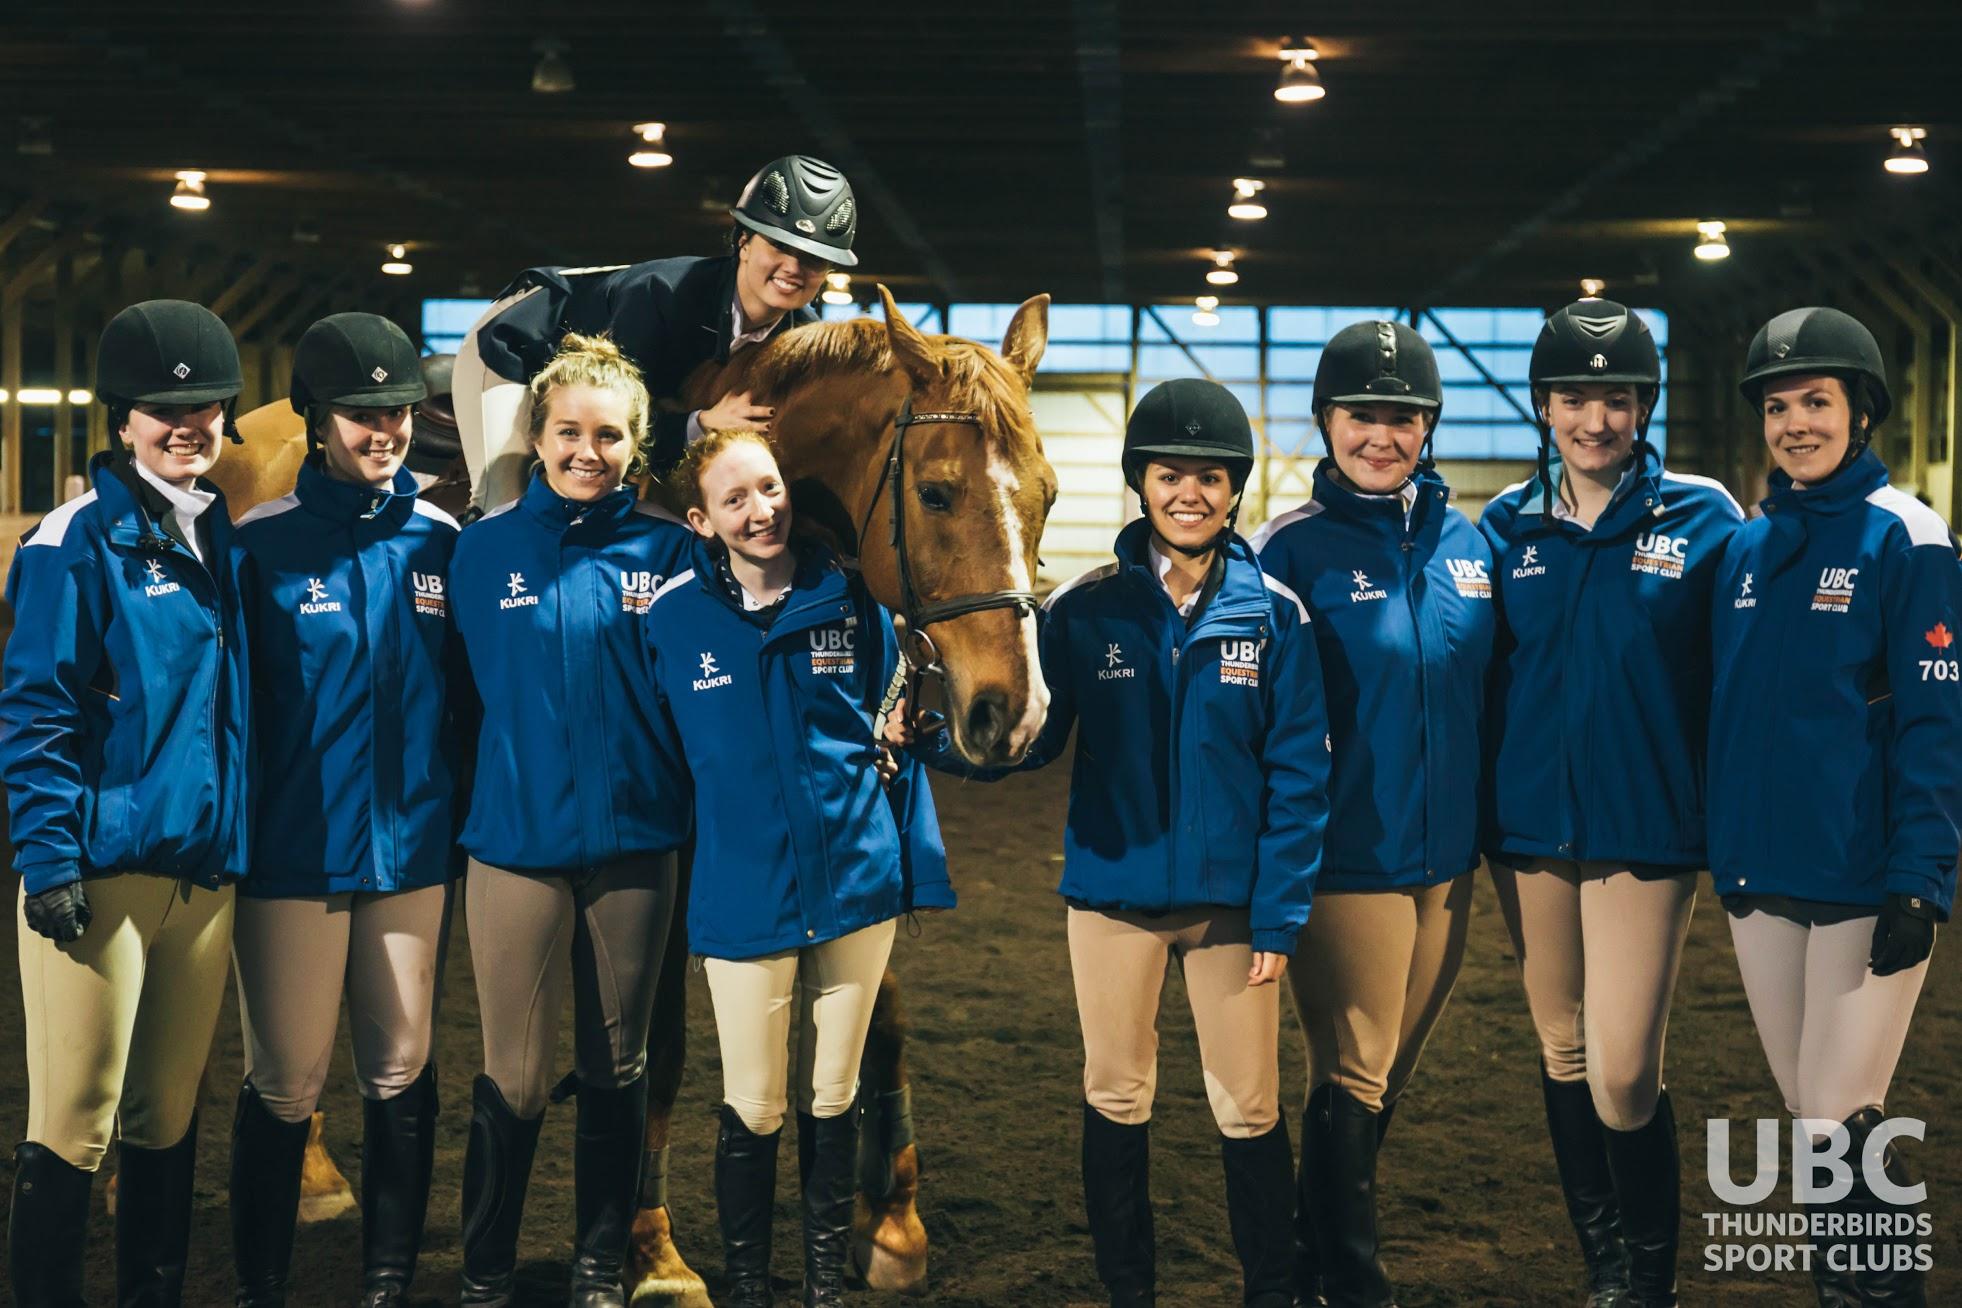 Equestrian Ubc Thunderbirds Sport Clubs